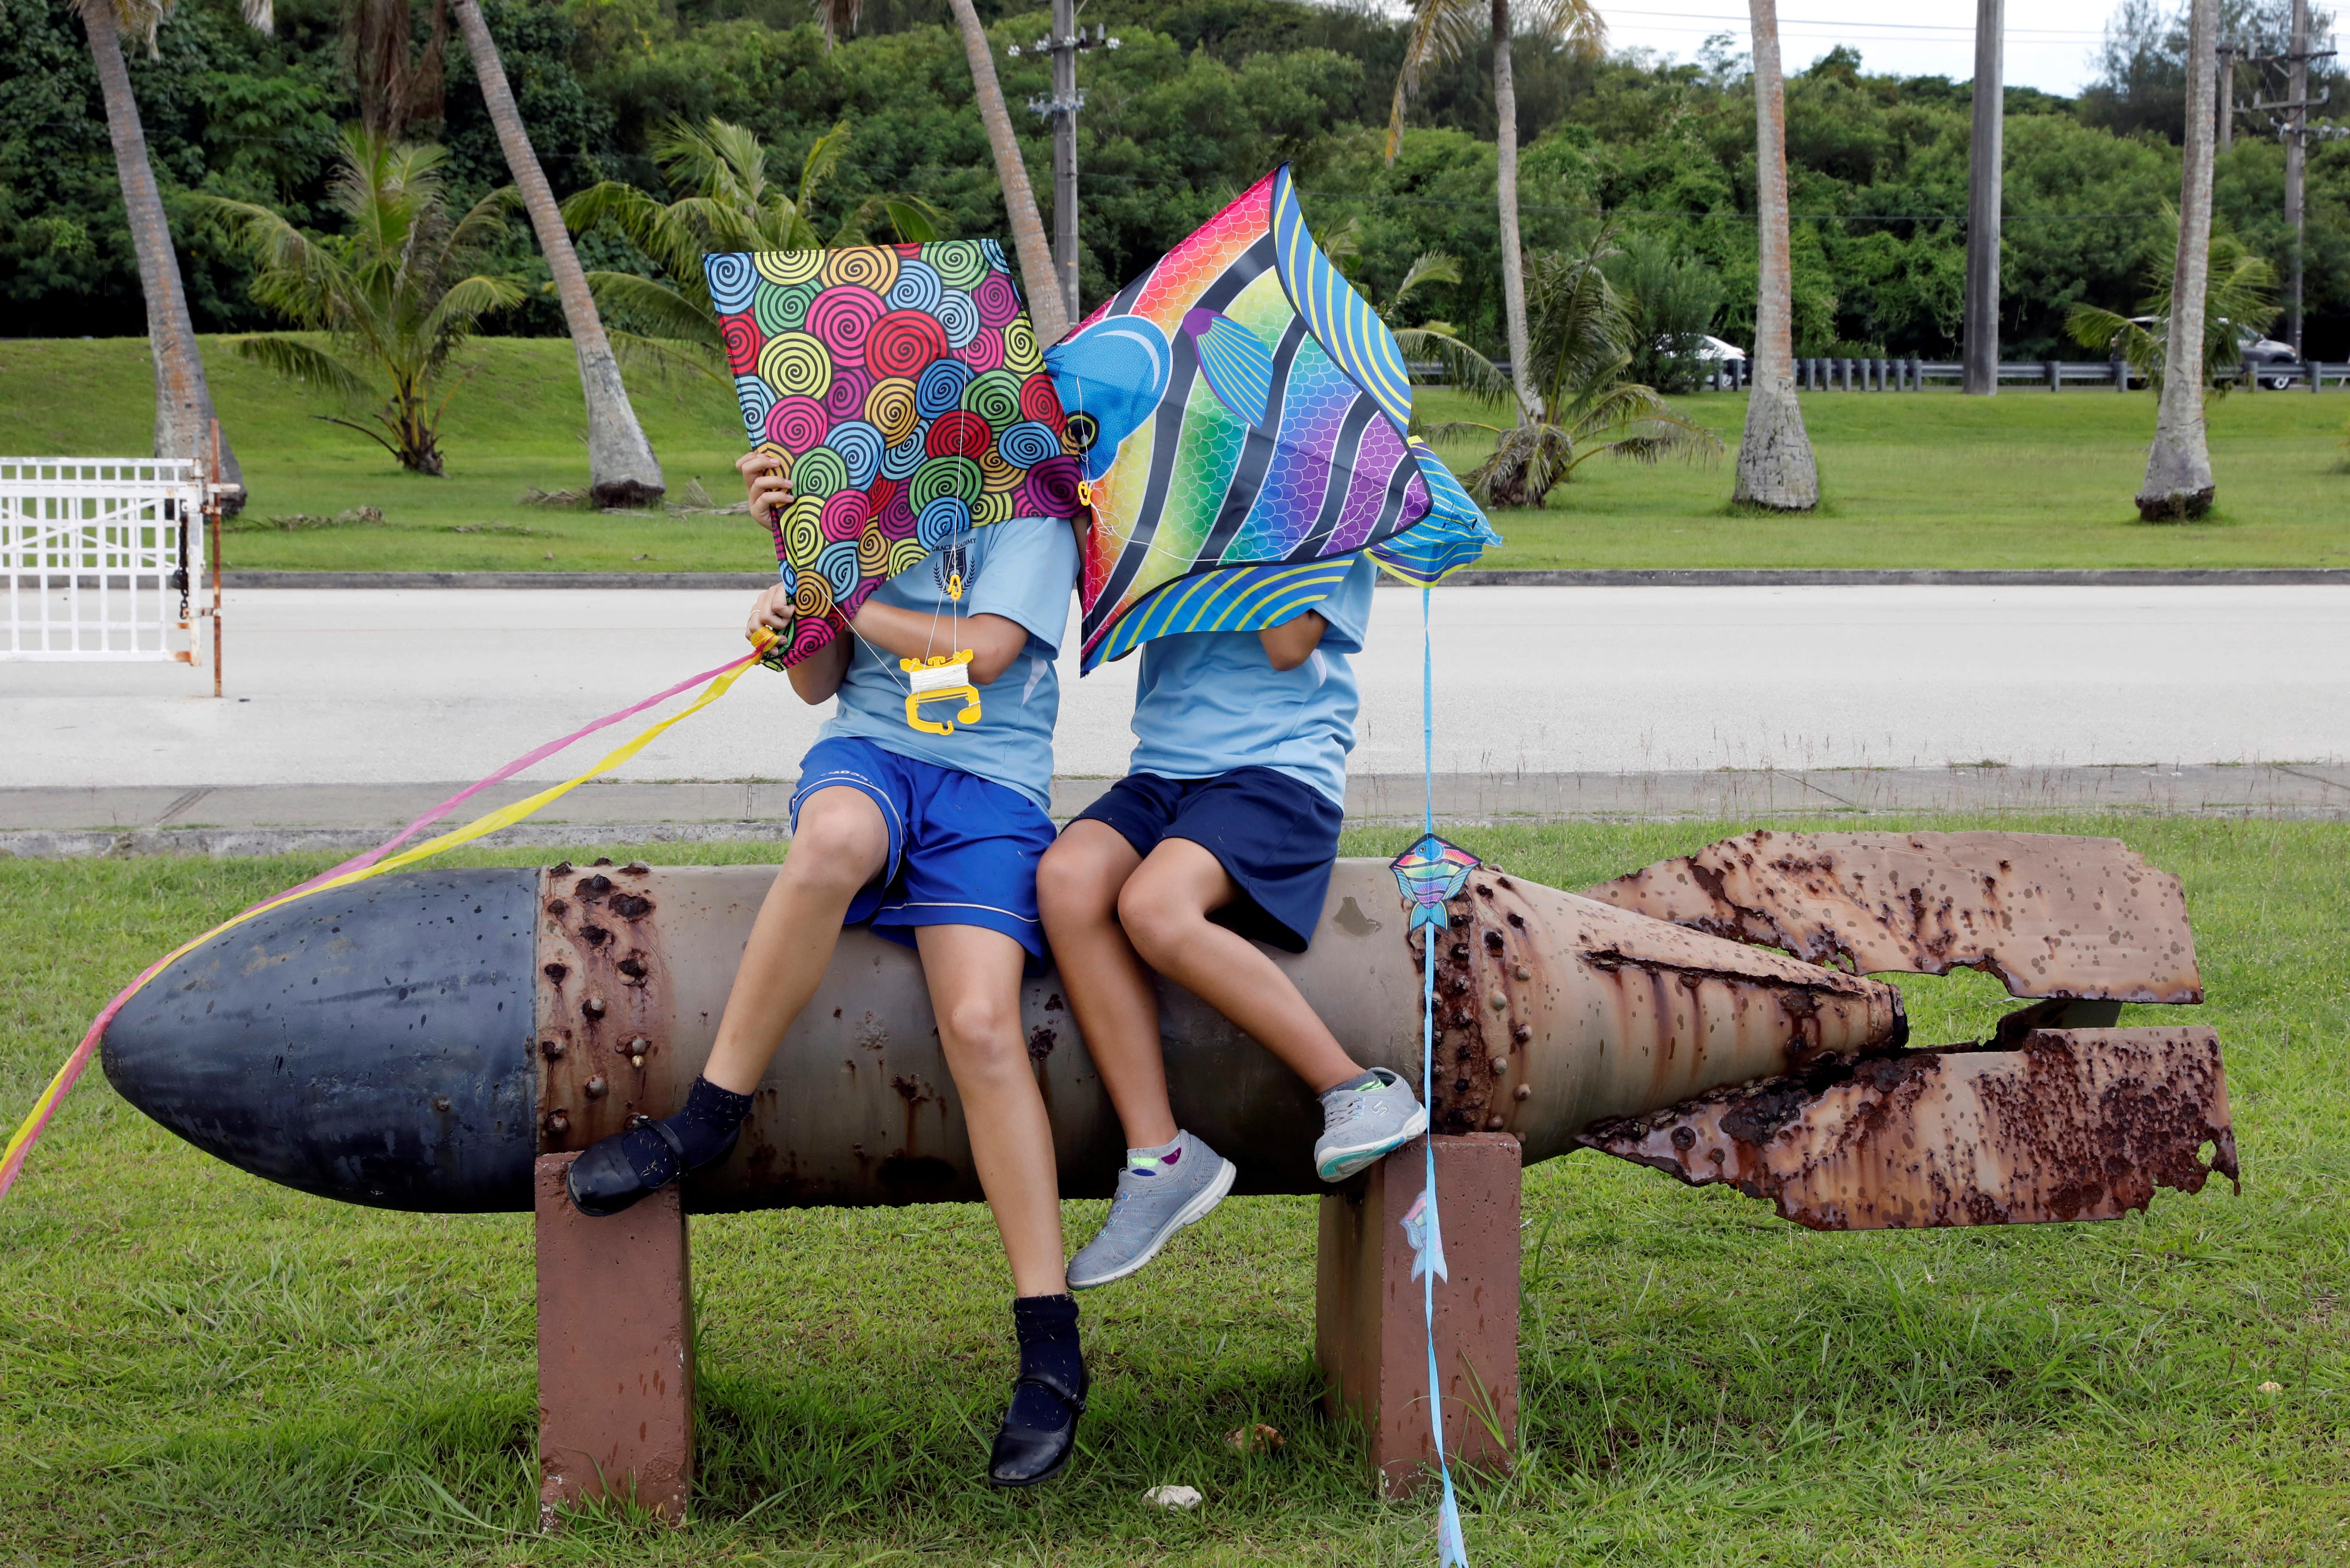 <p>Pupils sit on the World War II remnants of a torpedo at Asan Memorial Park on the island of Guam, a U.S. Pacific Territory, August 11, 2017. (Erik De Castro/Reuters) </p>